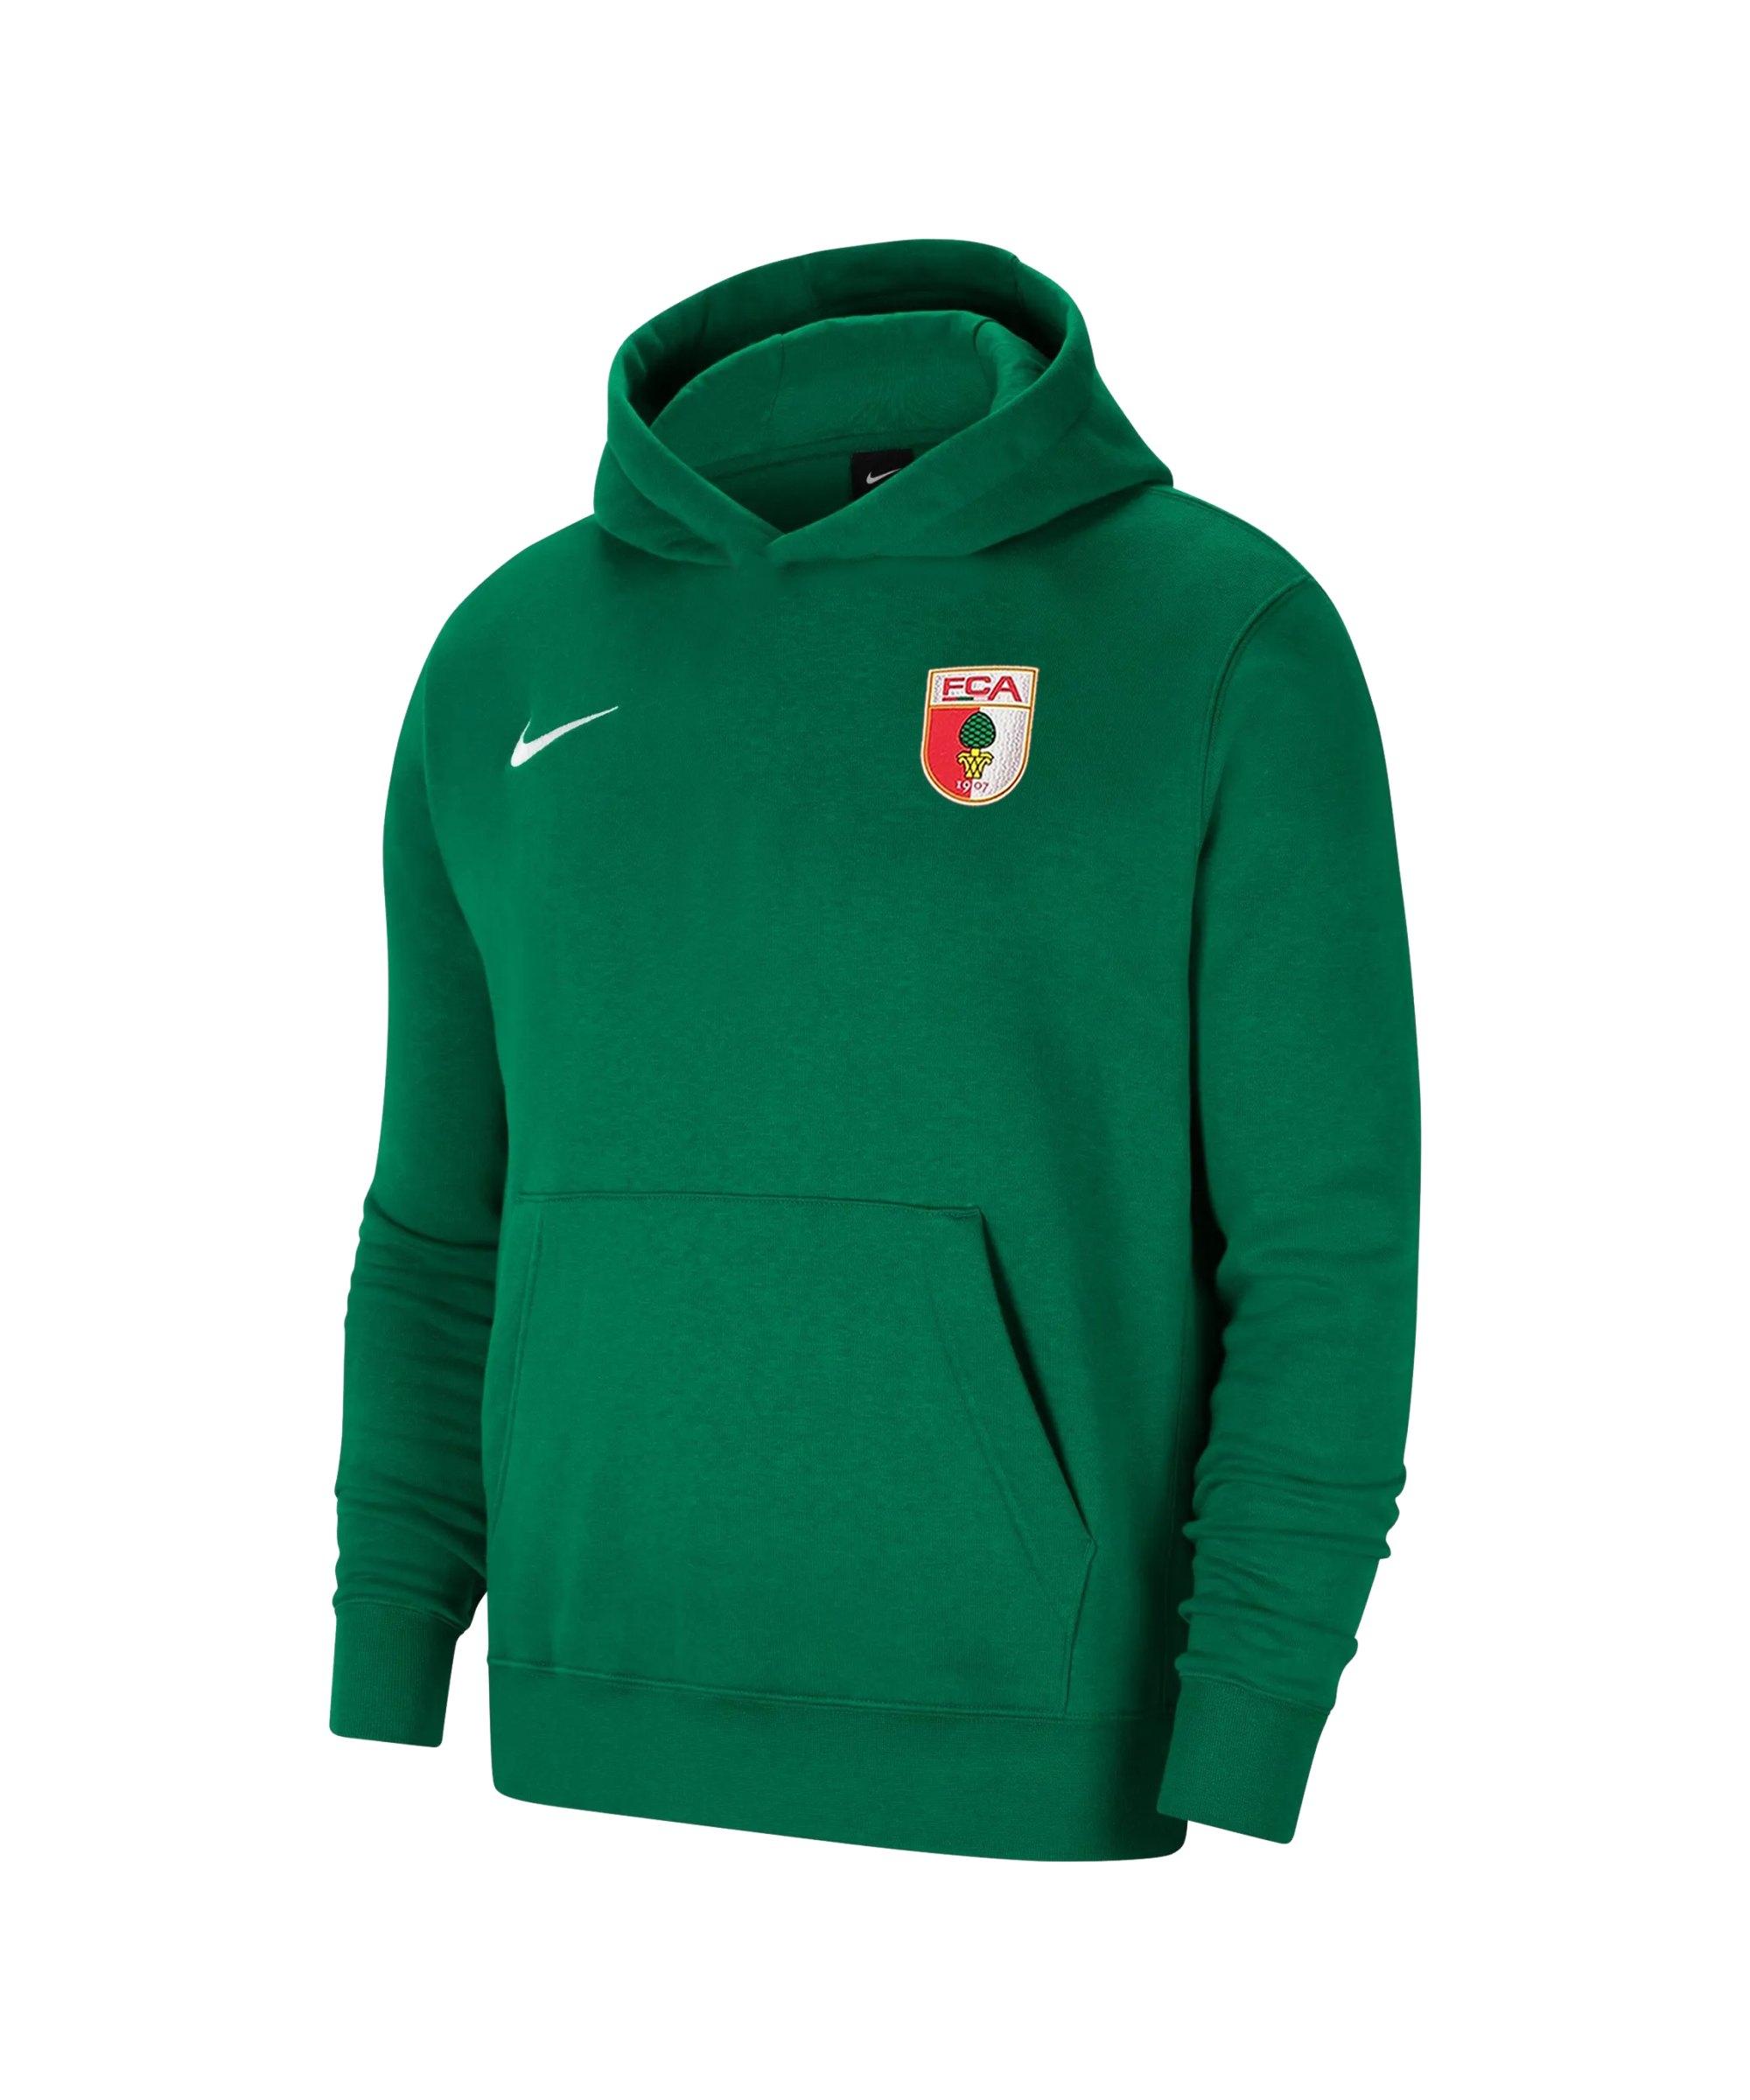 Nike FC Augsburg Fleece Hoody Kids Grün F302 - gruen